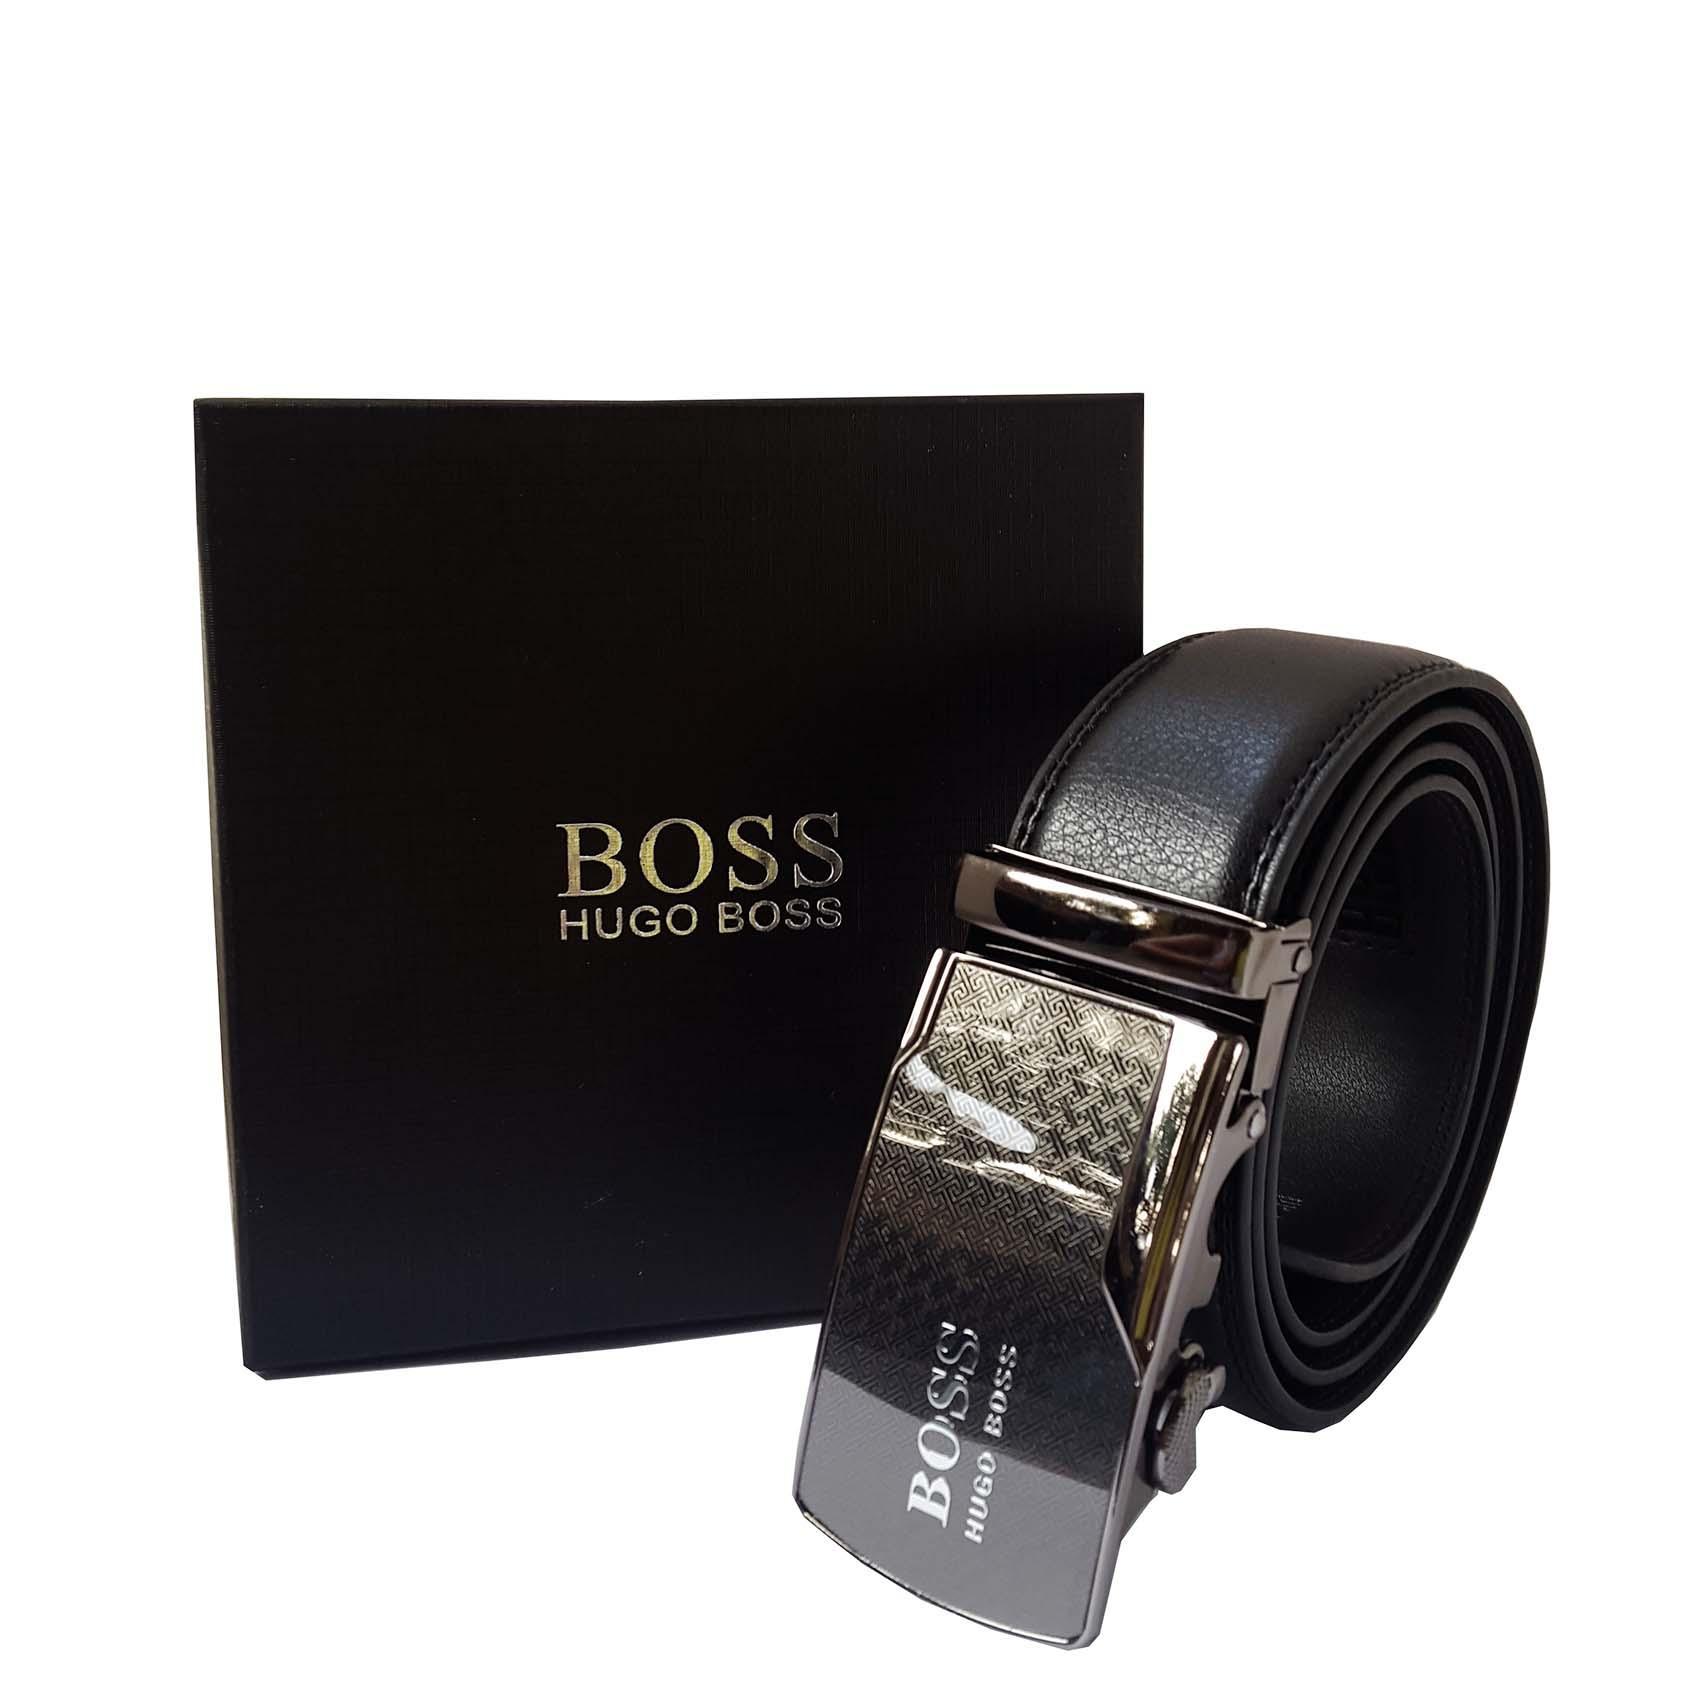 Ikat Pinggang / Ban Pinggang /  Gesper Pria Branded Hugo Boss Black Exclusive